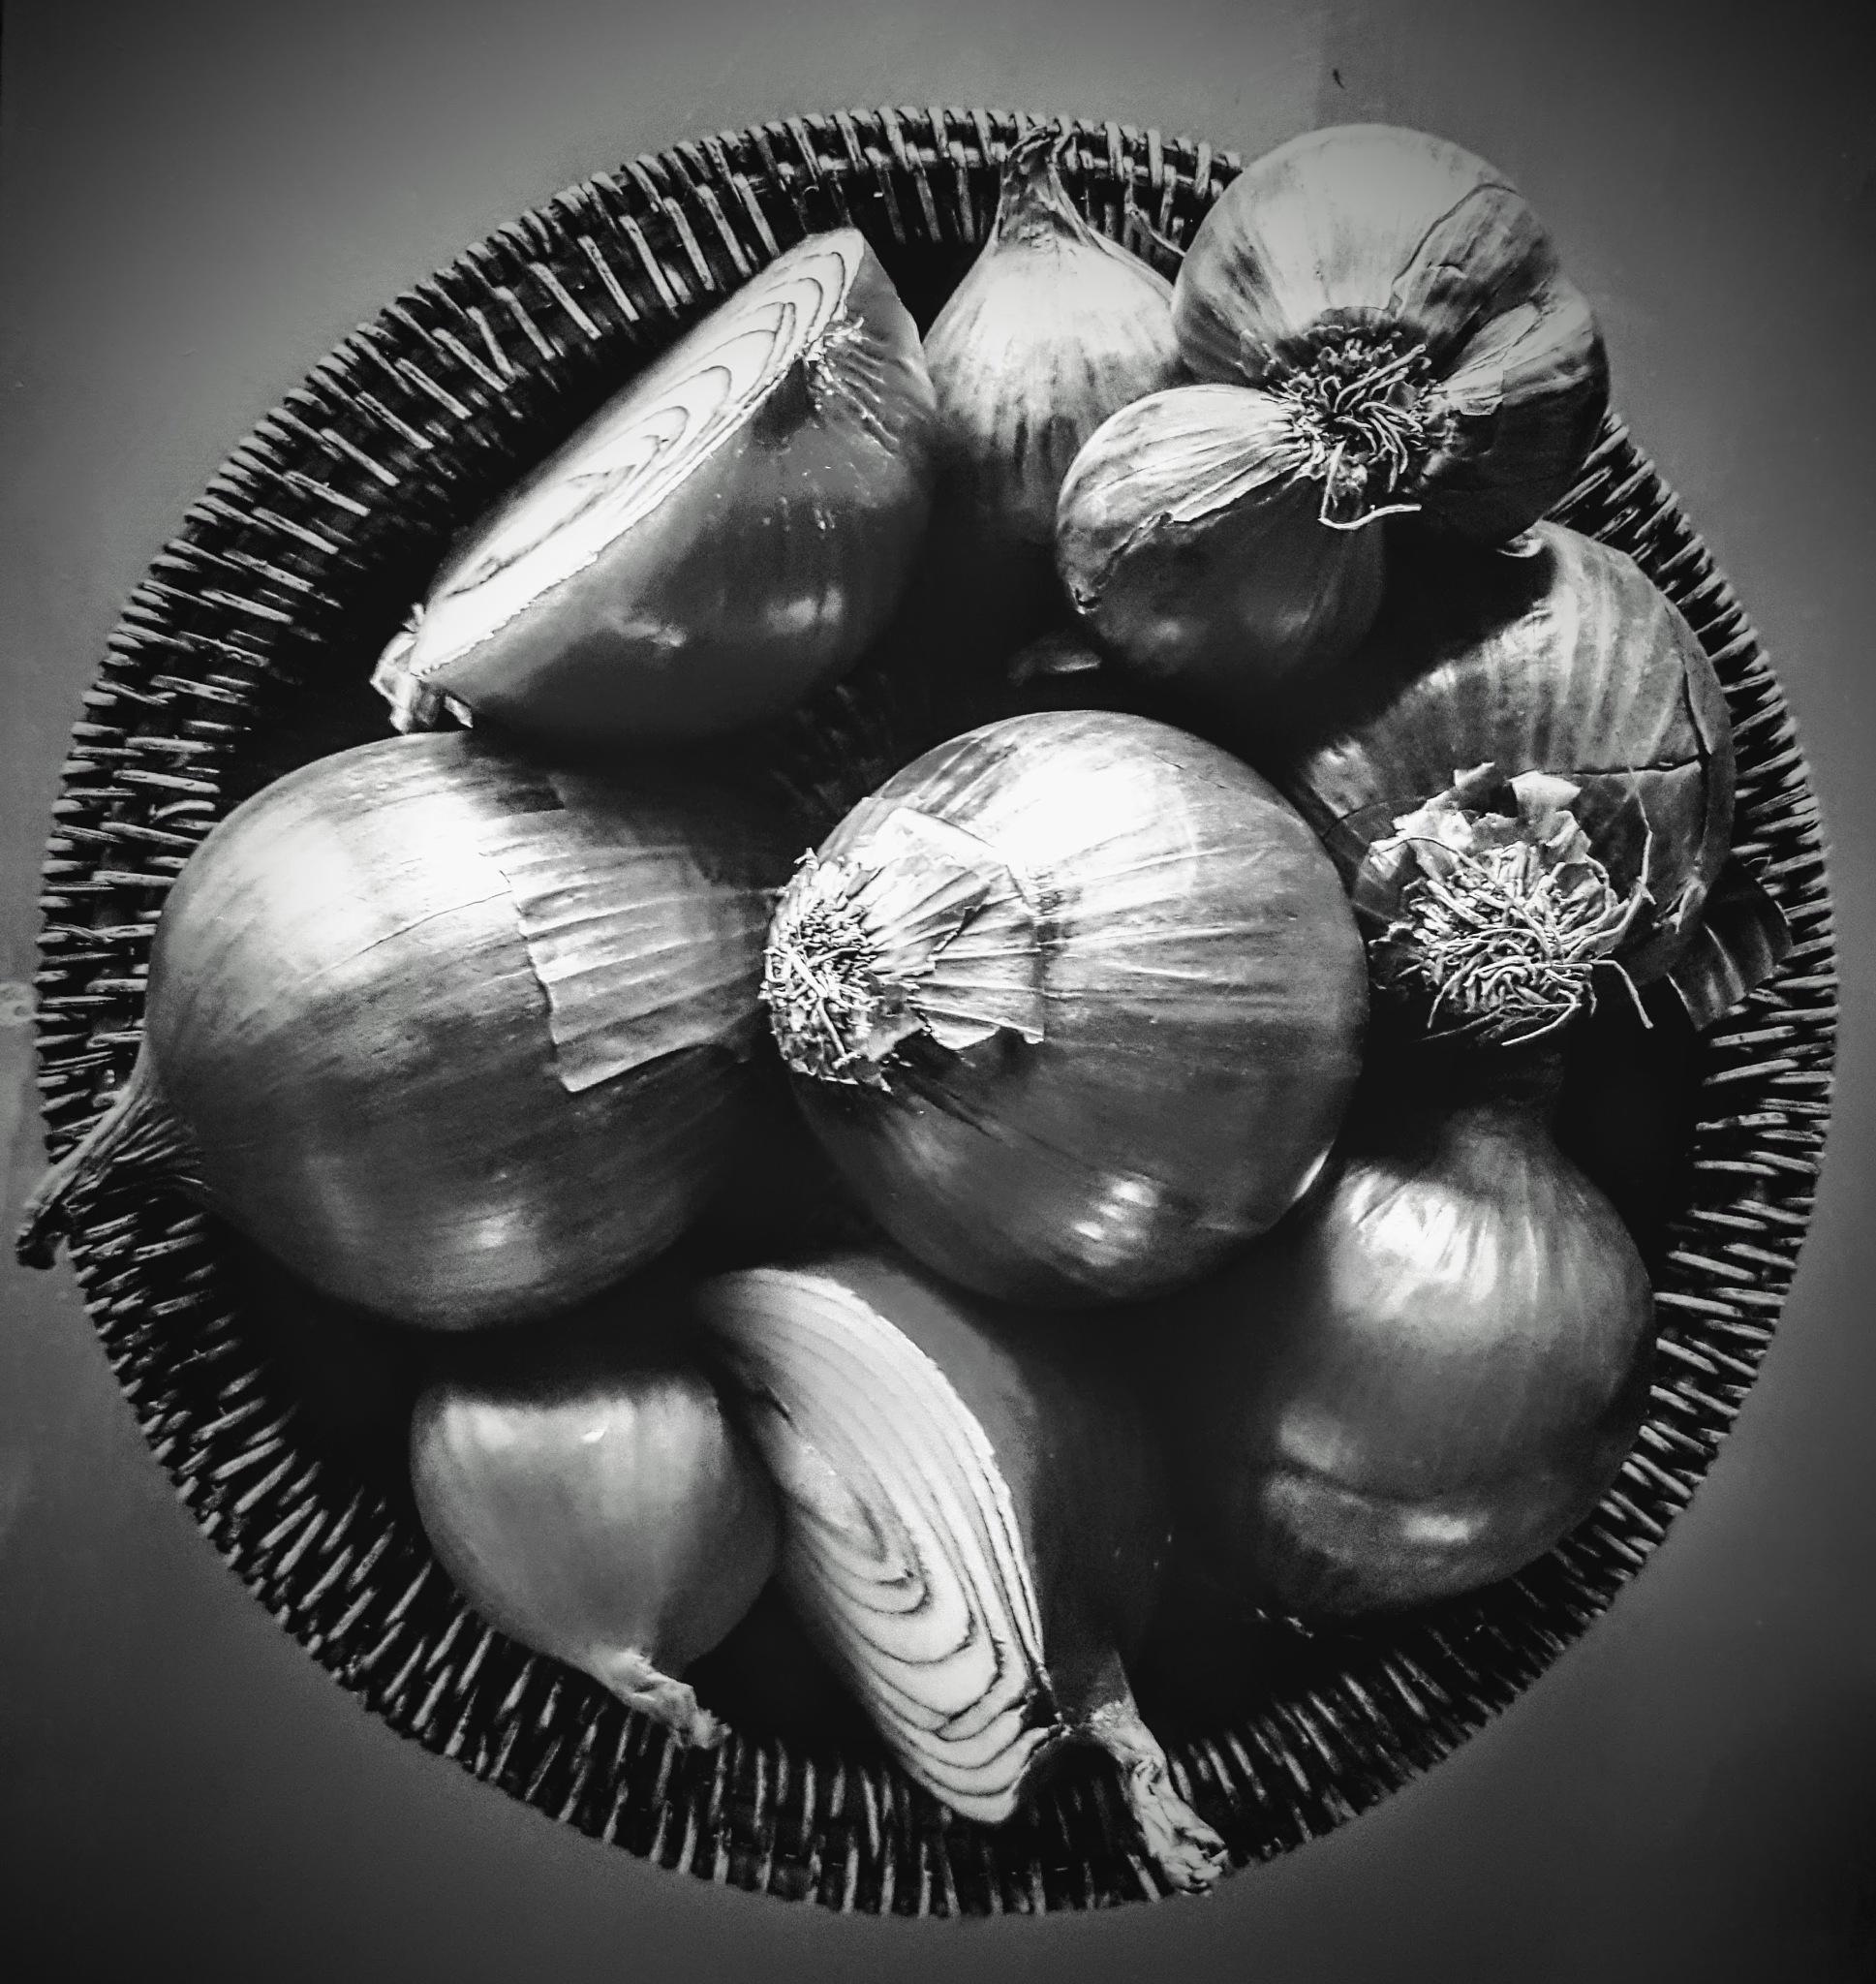 Basket of onions by Amanda Savage